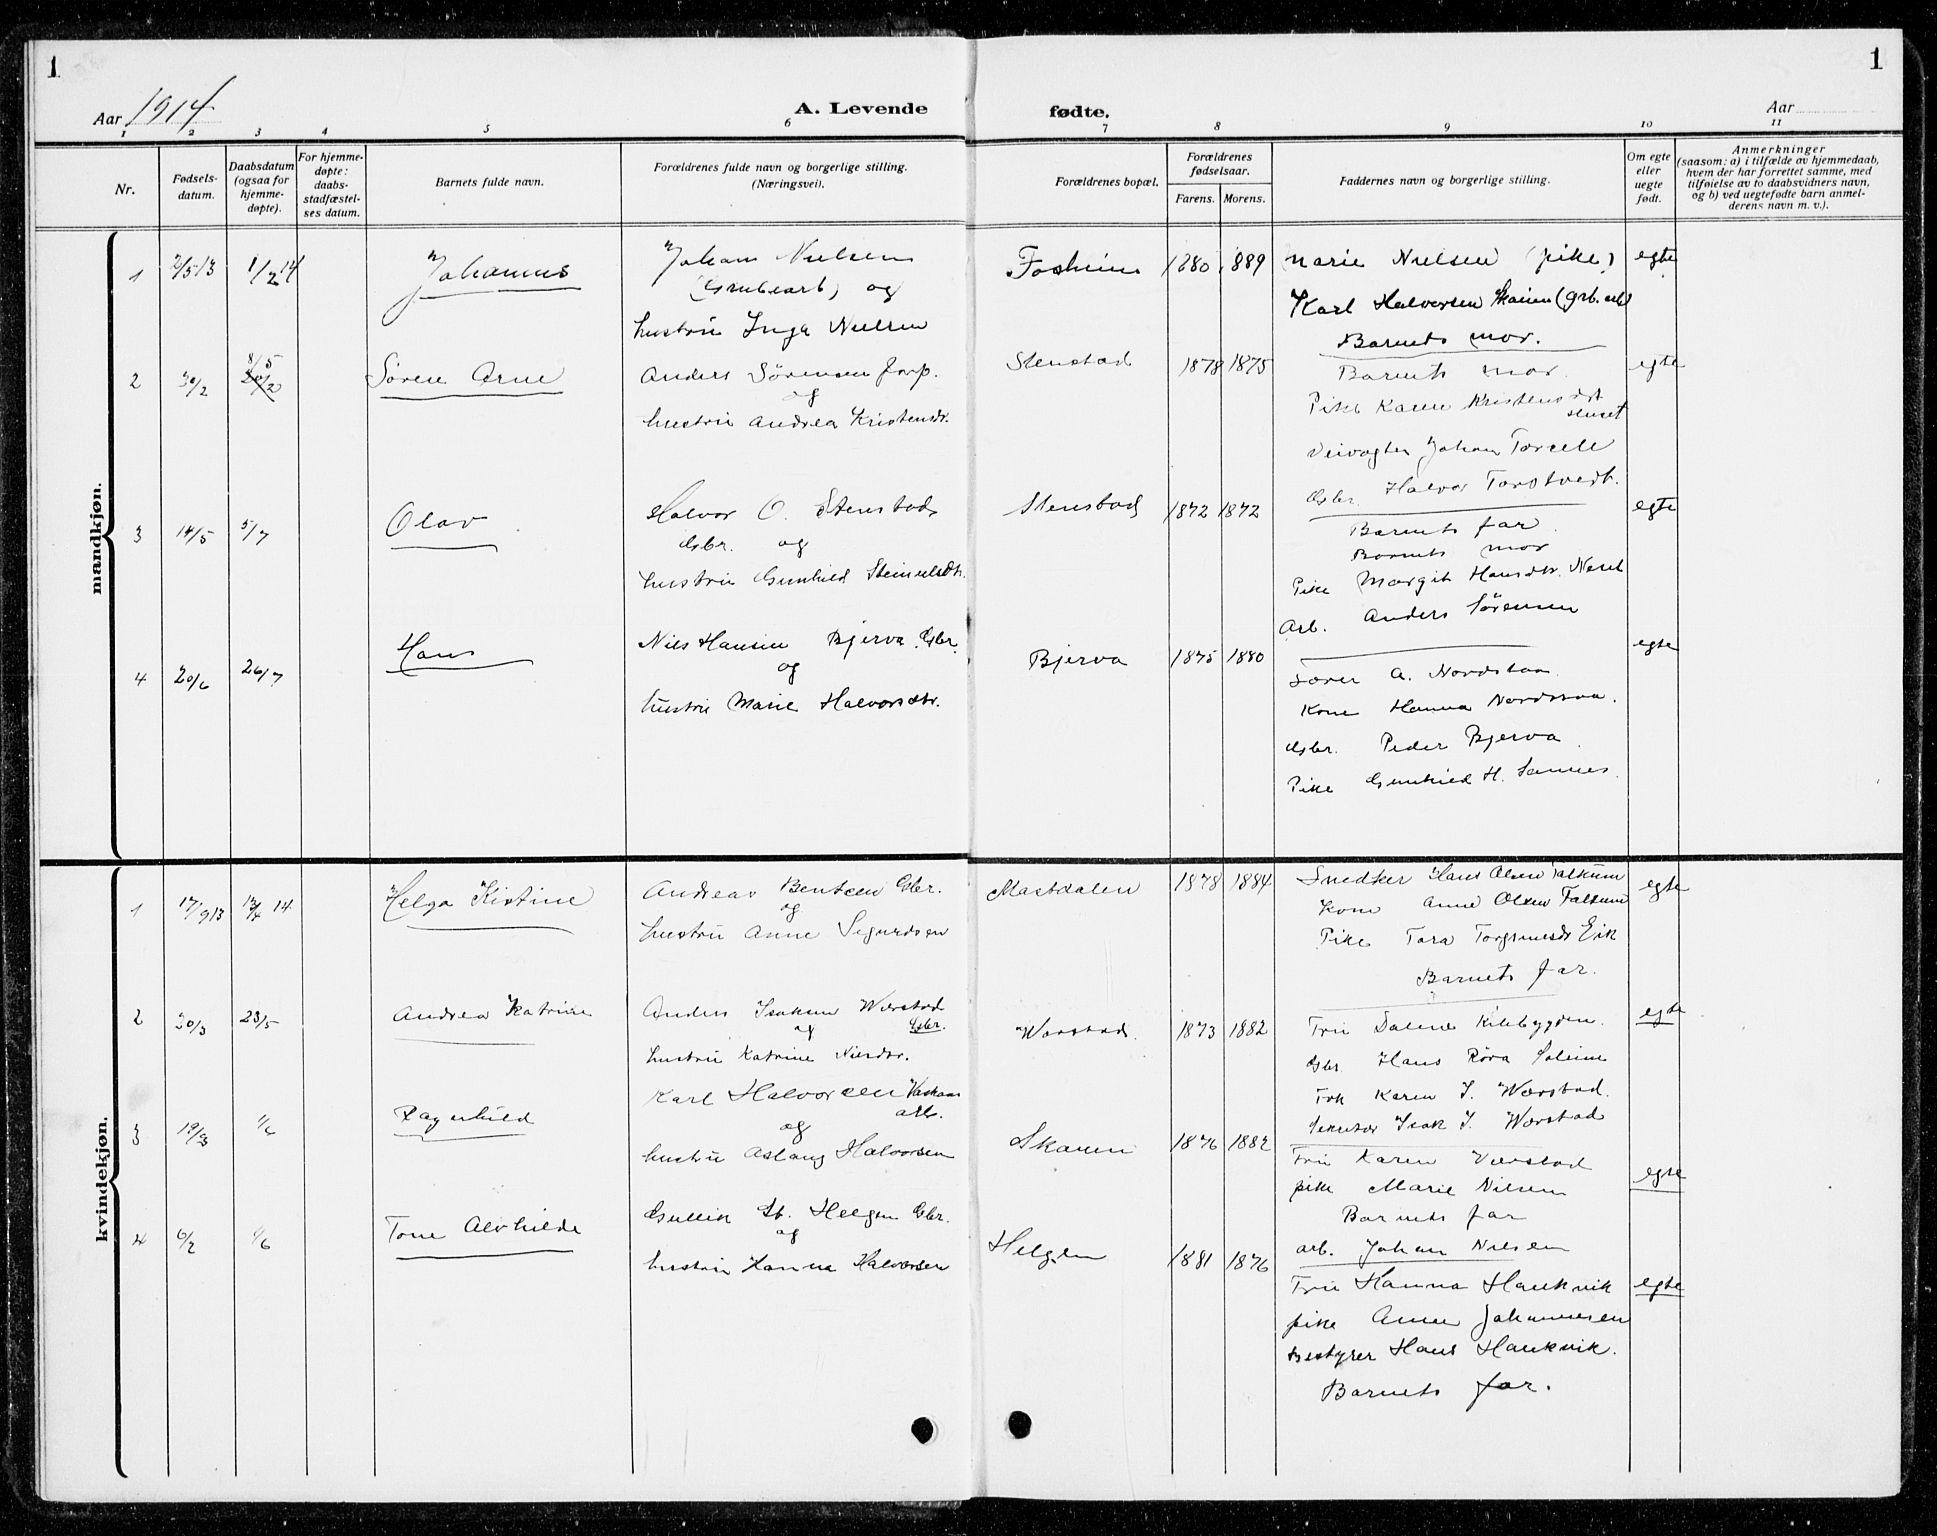 SAKO, Holla kirkebøker, G/Gb/L0003: Klokkerbok nr. II 3, 1914-1941, s. 1